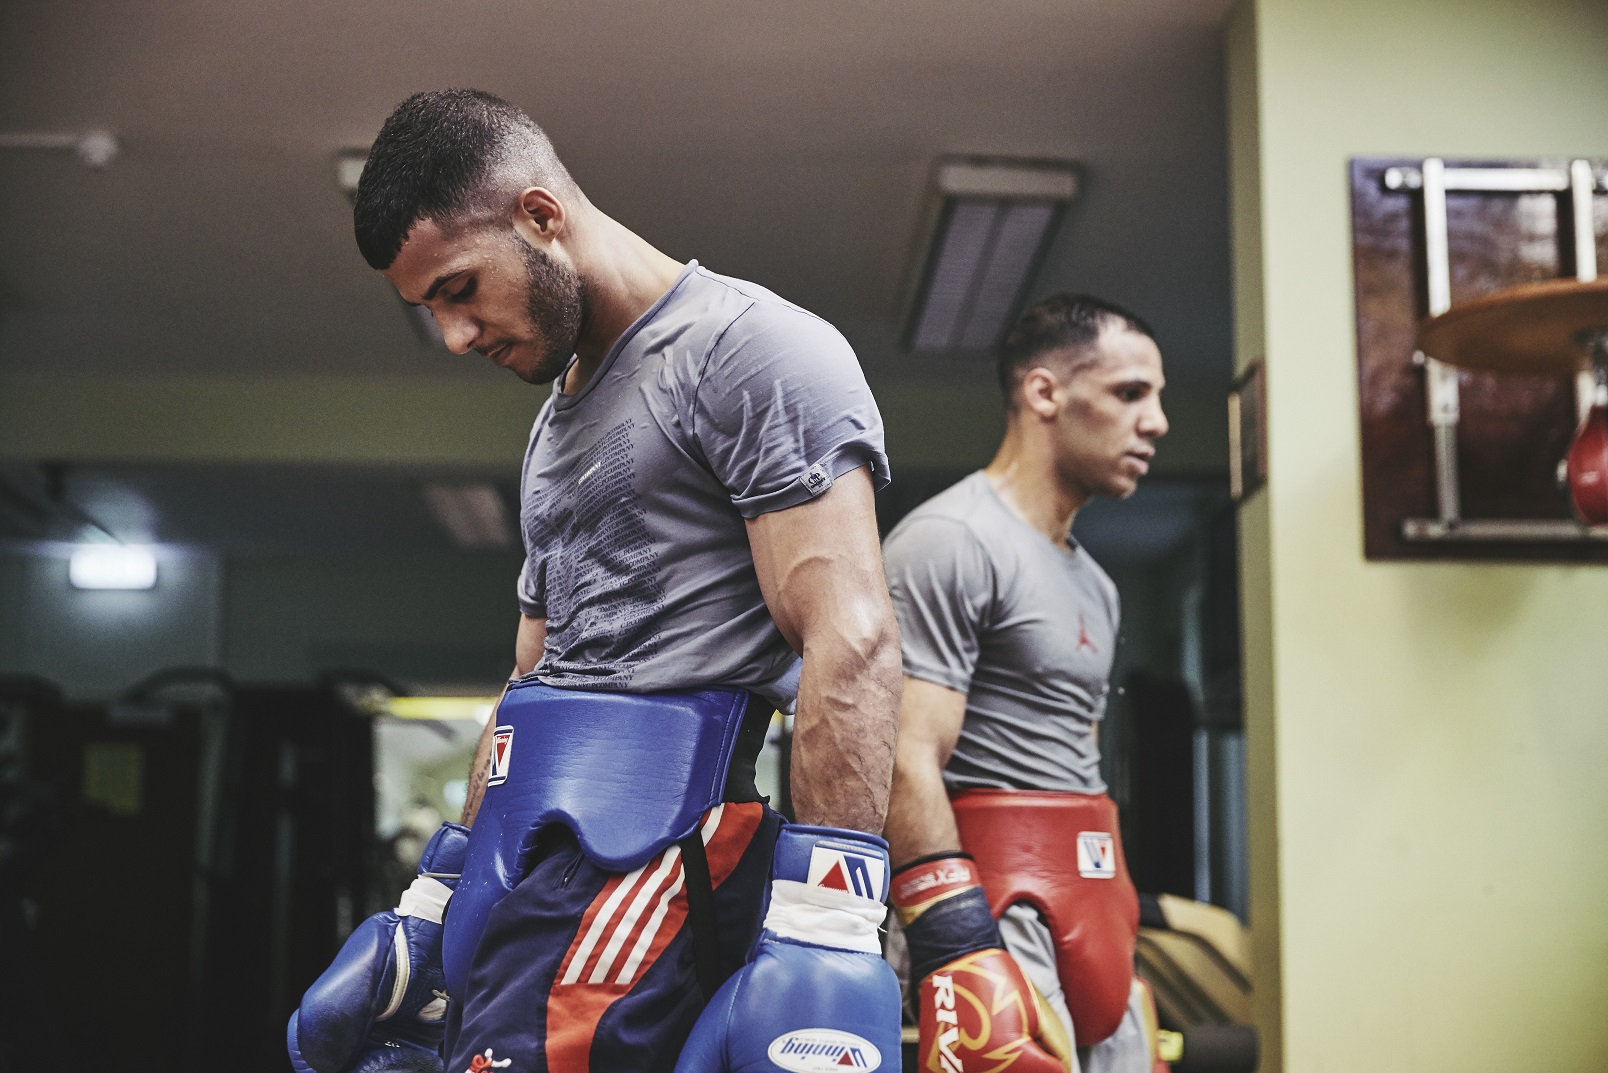 Kal and Gamal Yafai prepare for Saturday night